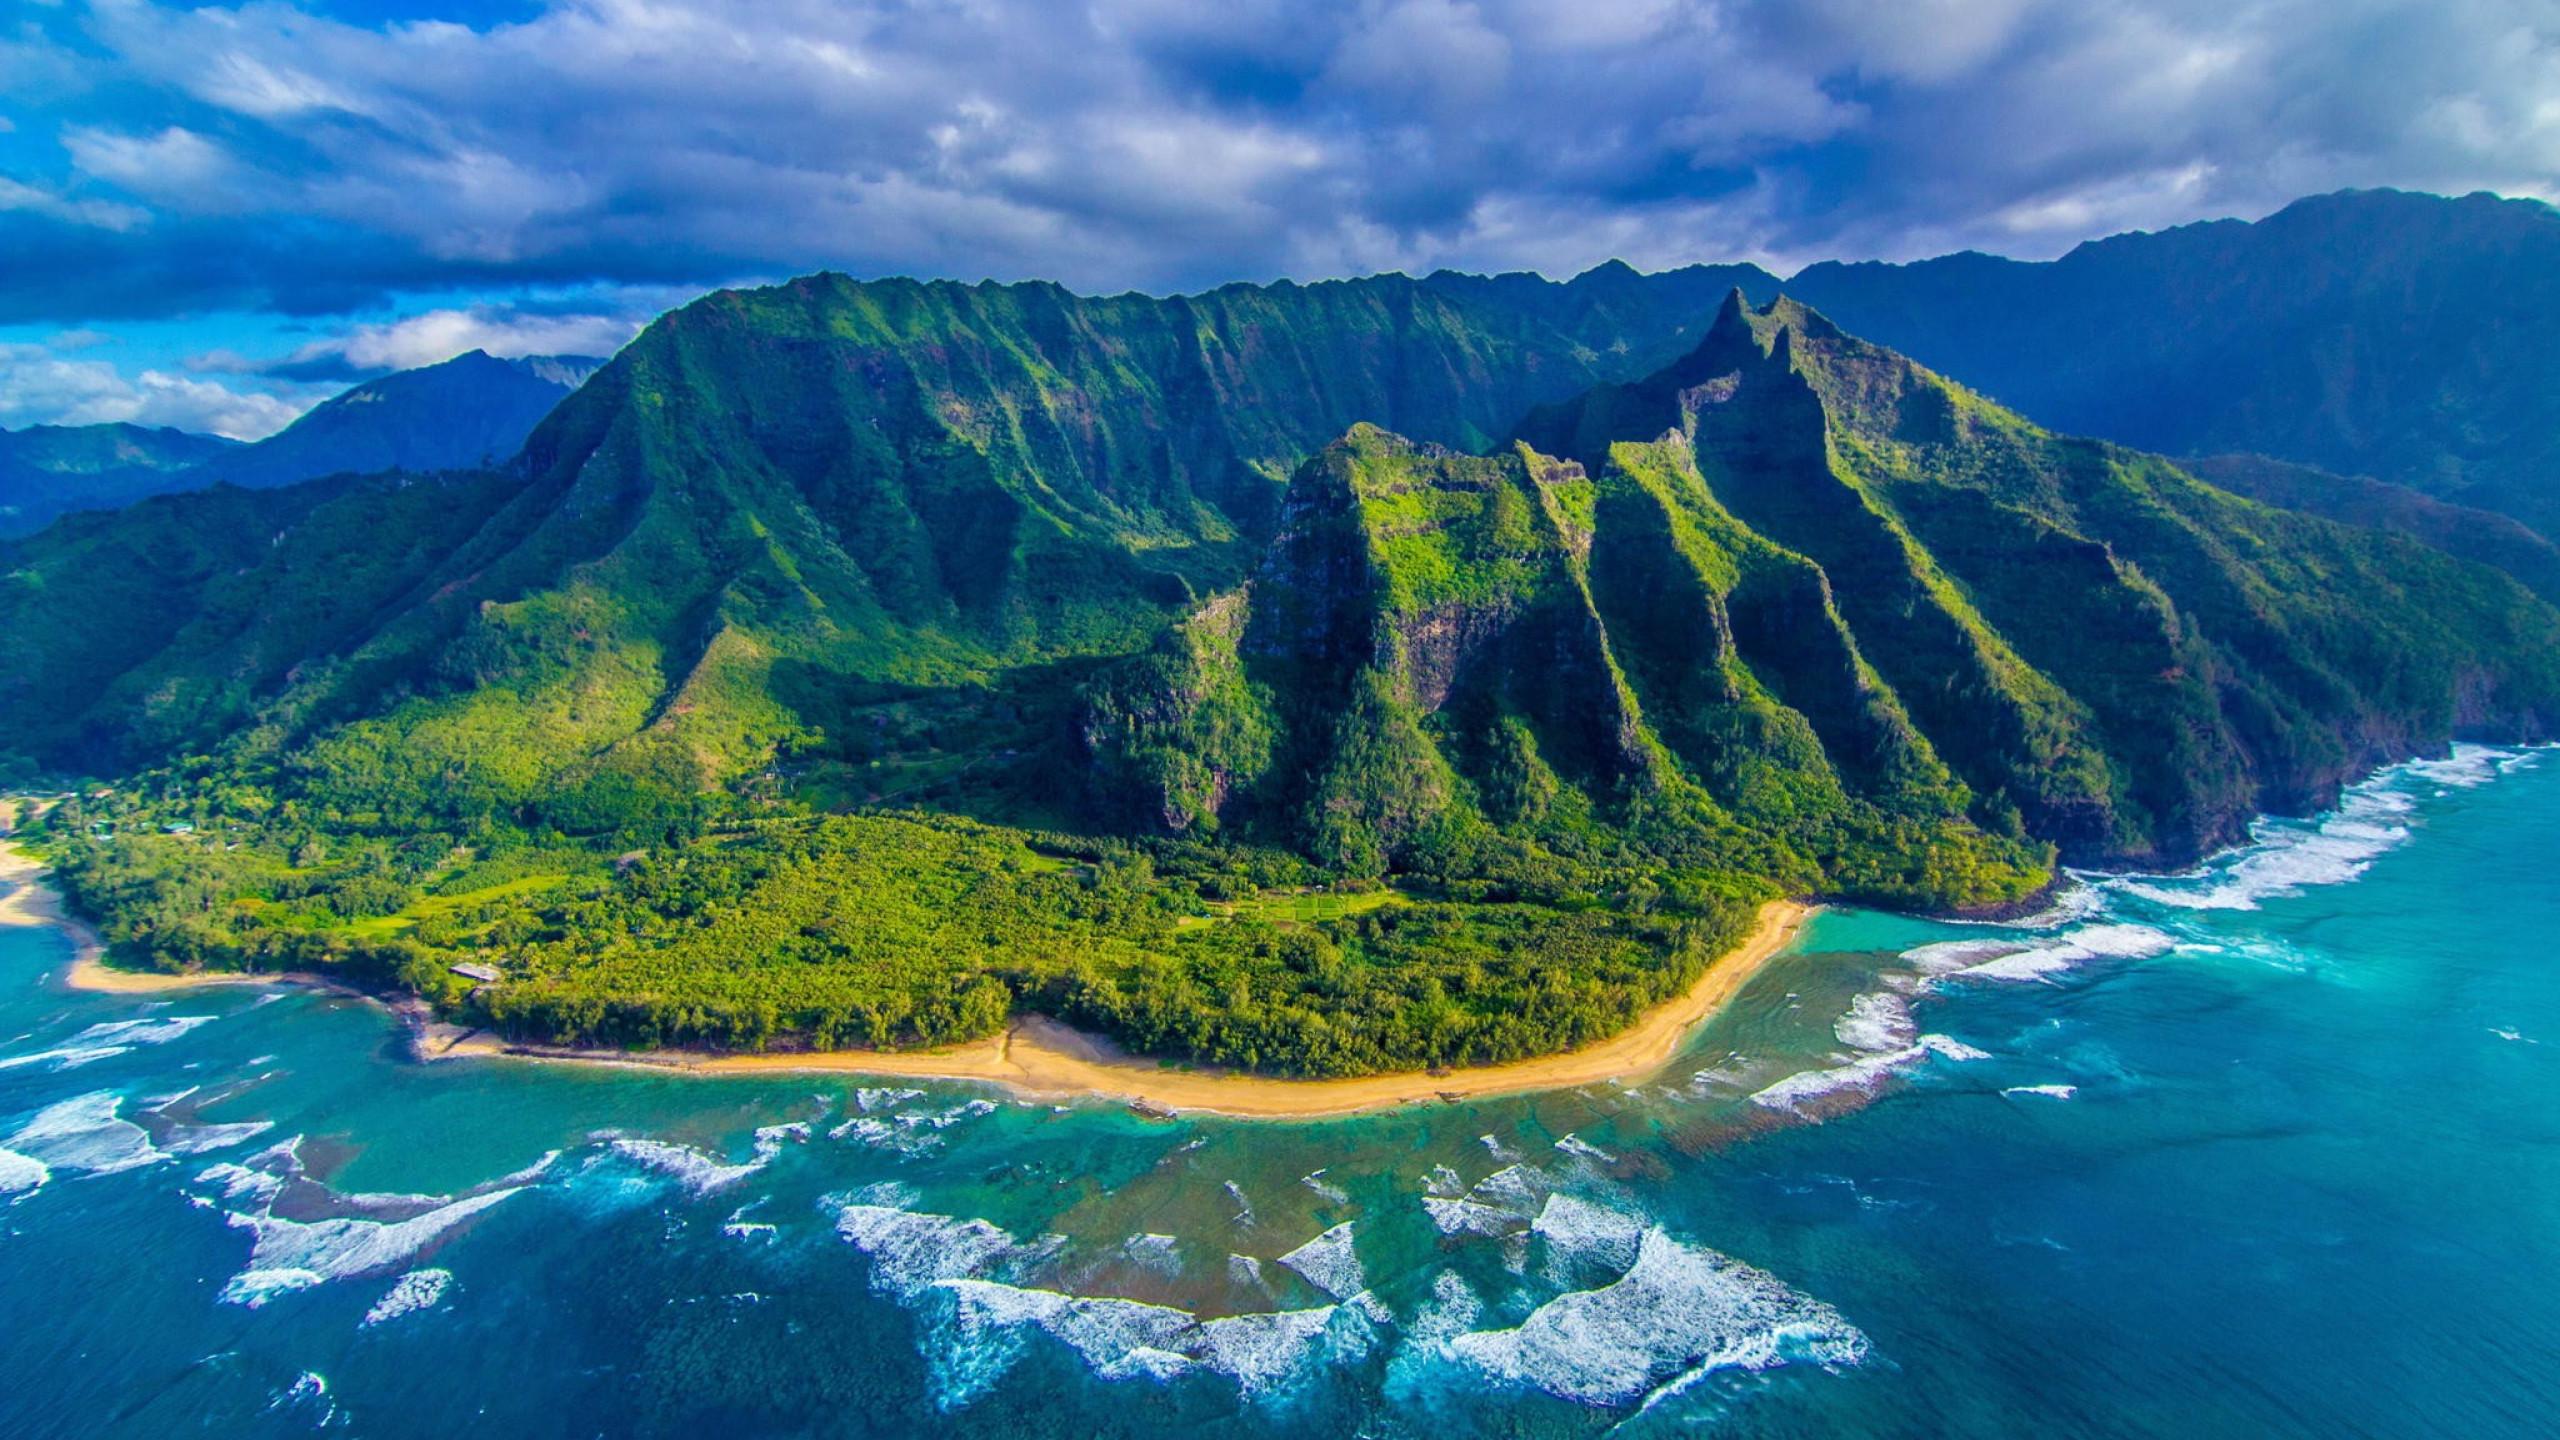 Hawaii Wallpaper Picture For Desktop Wallpaper 2560 x 1440 px 1.08 MB beach  sunset sunrise wave